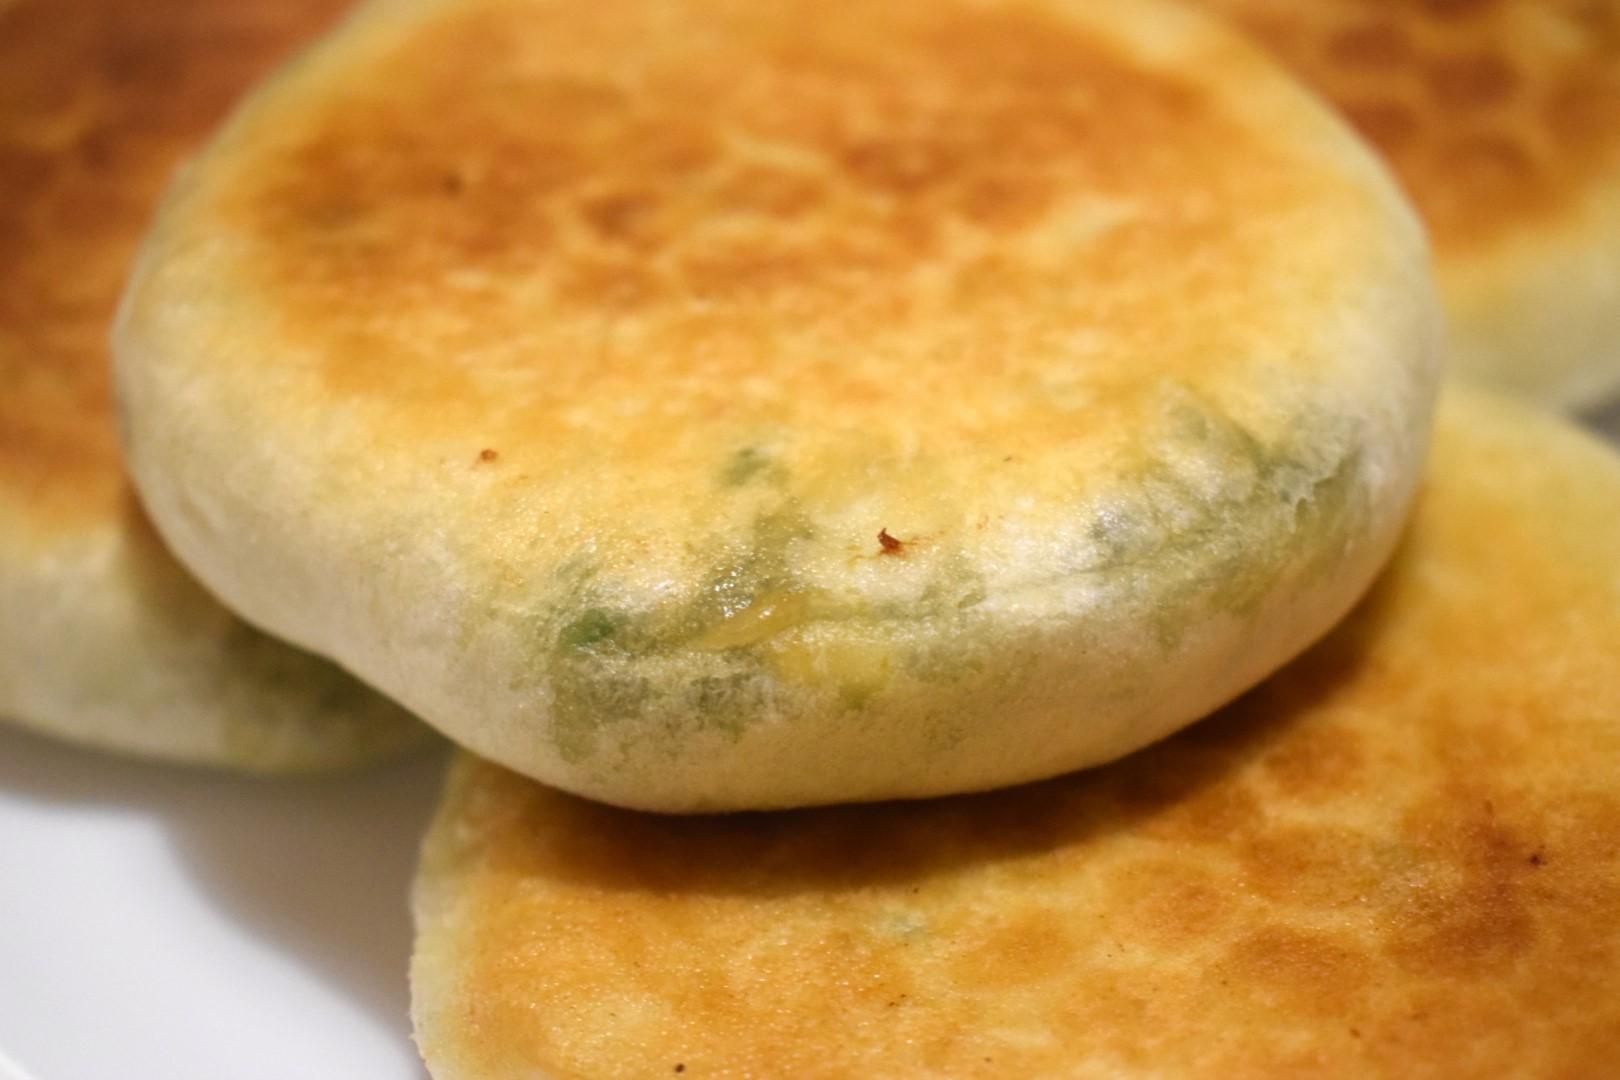 Chives and eggs pancakes (韭菜鸡蛋饼)Yummy Yummy Dumplings, 79 Huron St, Toronto